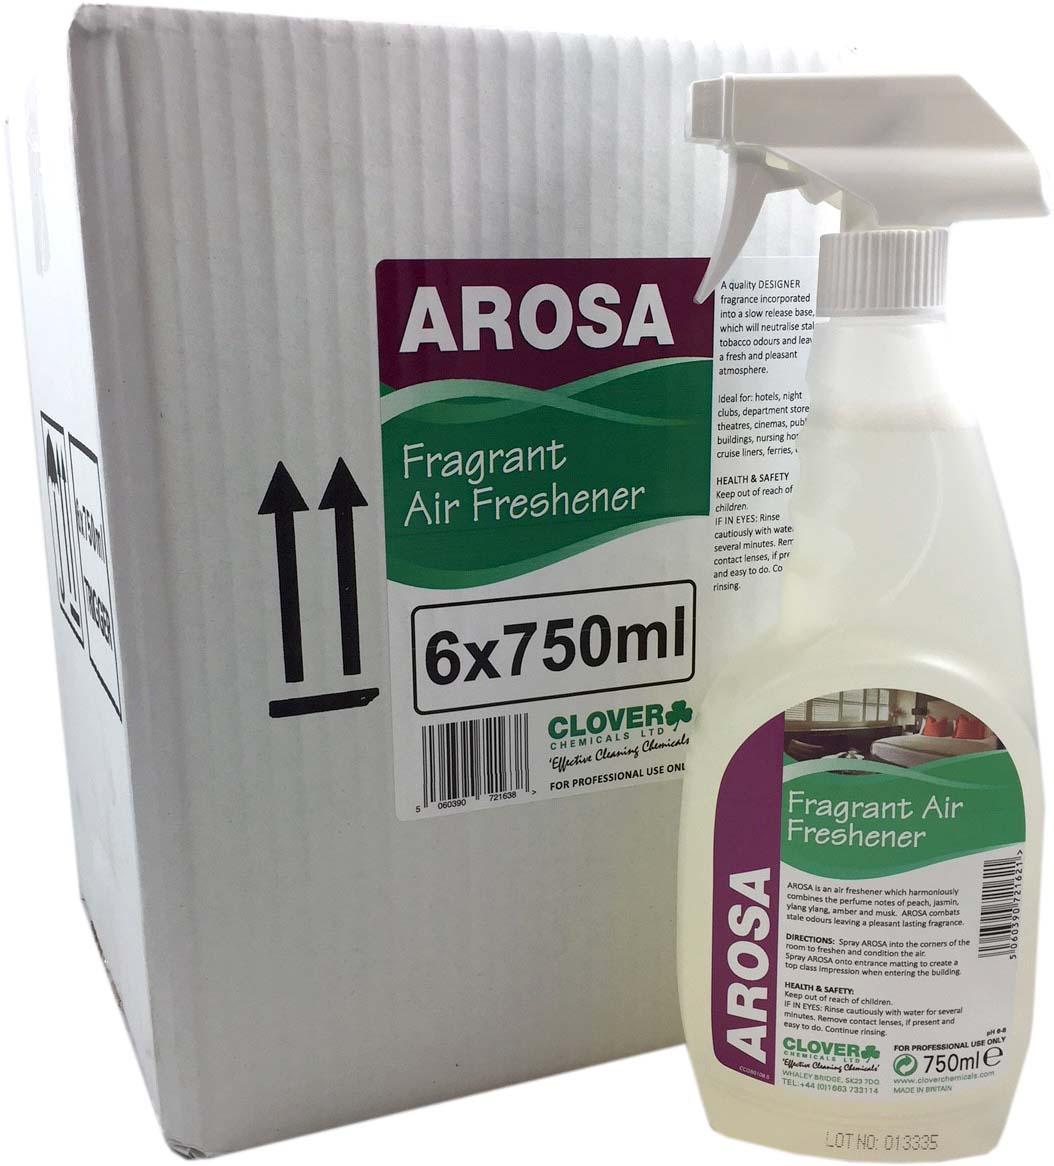 Arosa--Fragrant-Air-Freshener-6-x-750ml--case-